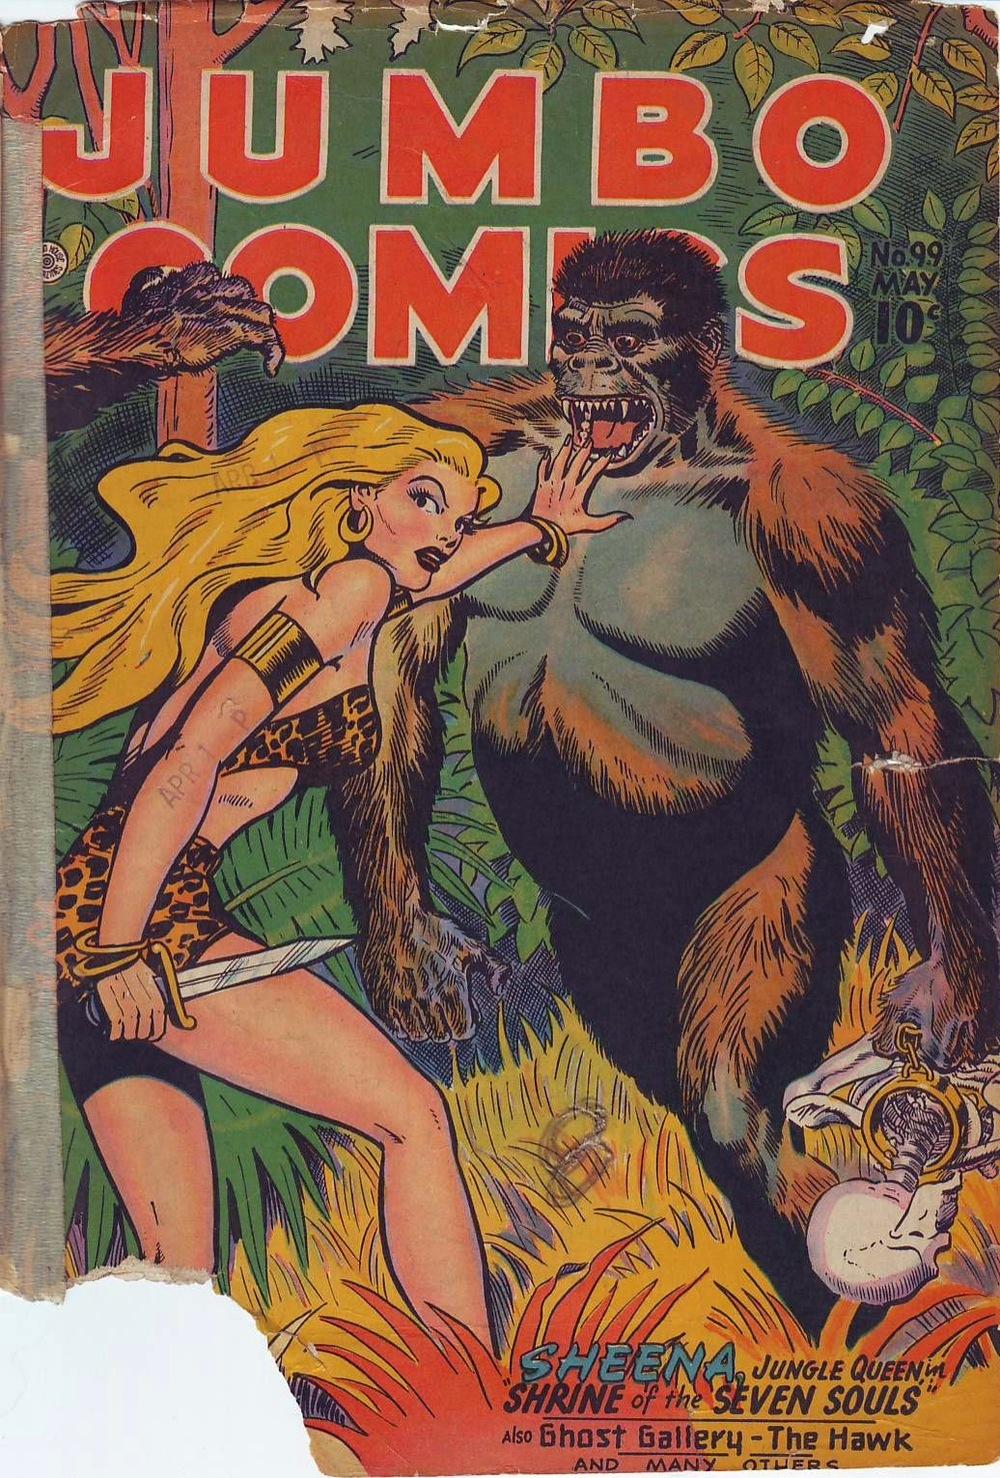 Jumbo_Comics_099_01-FC.jpg